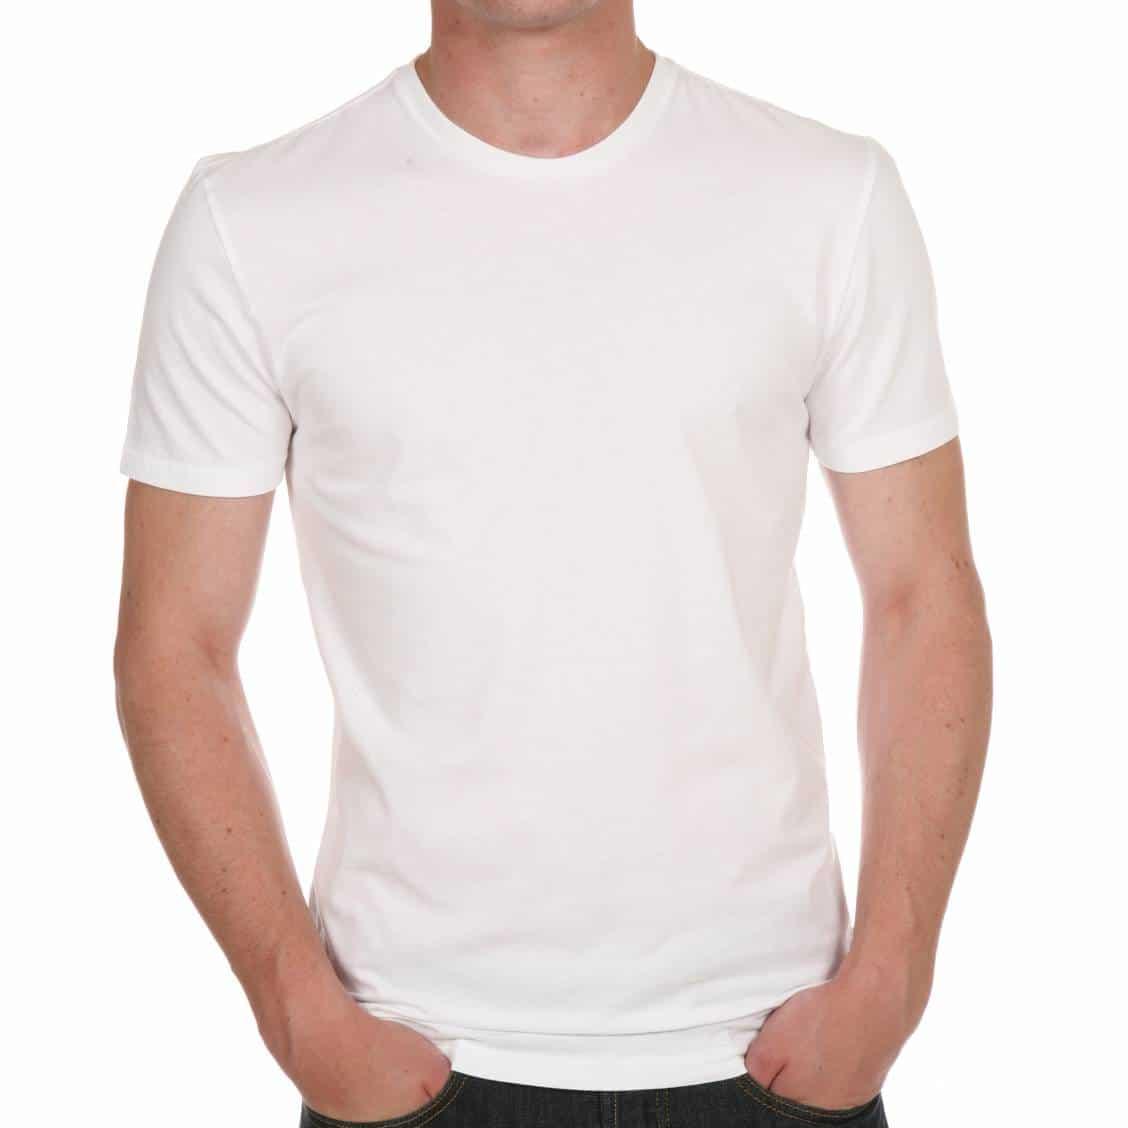 tee shirt blanc je ne peux plus m 39 en passer. Black Bedroom Furniture Sets. Home Design Ideas